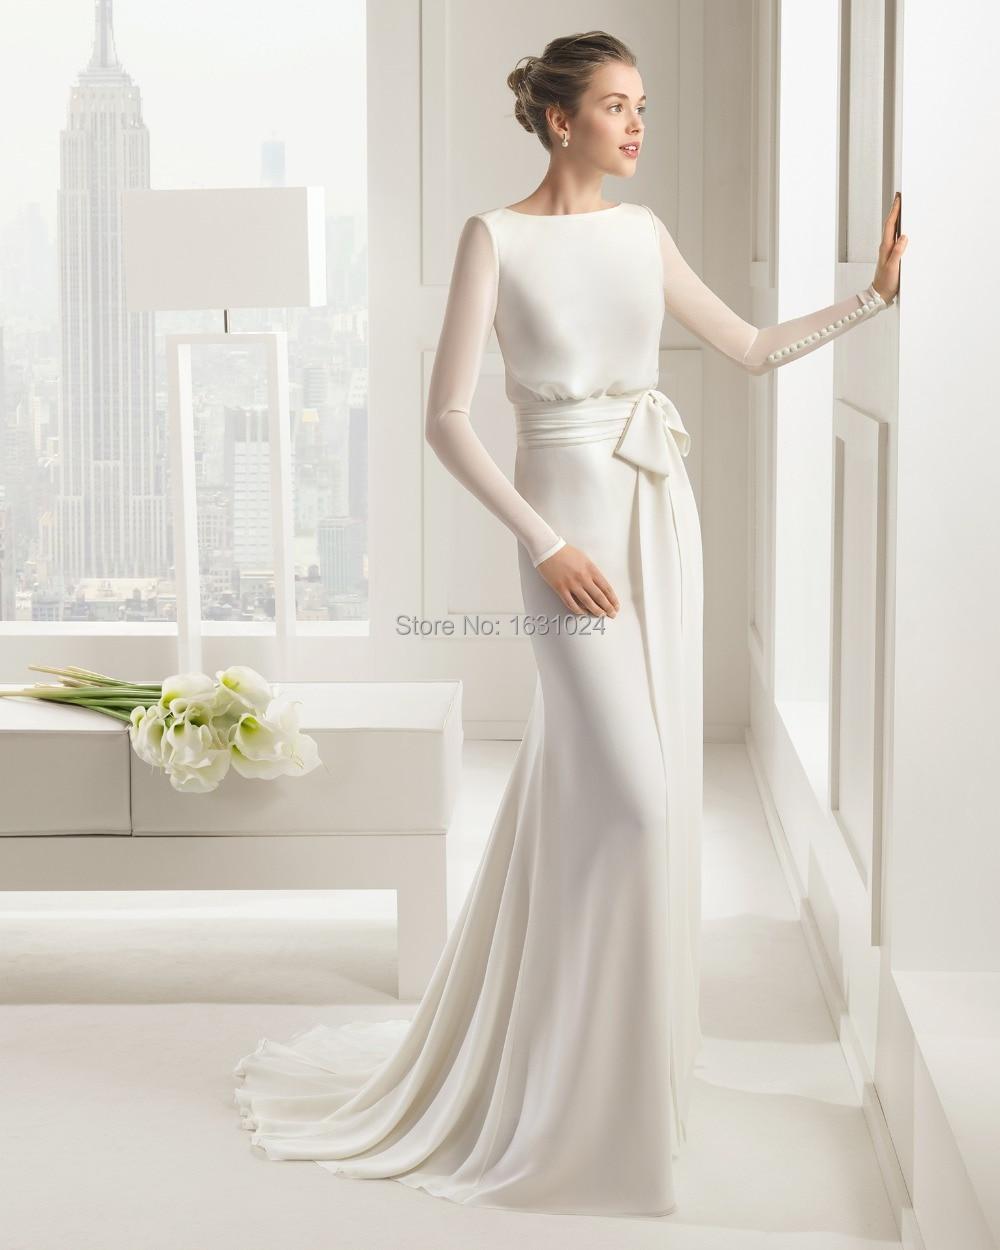 beautiful simple wedding dresses simple wedding dress Simple Beautiful Wedding Dresses Naf